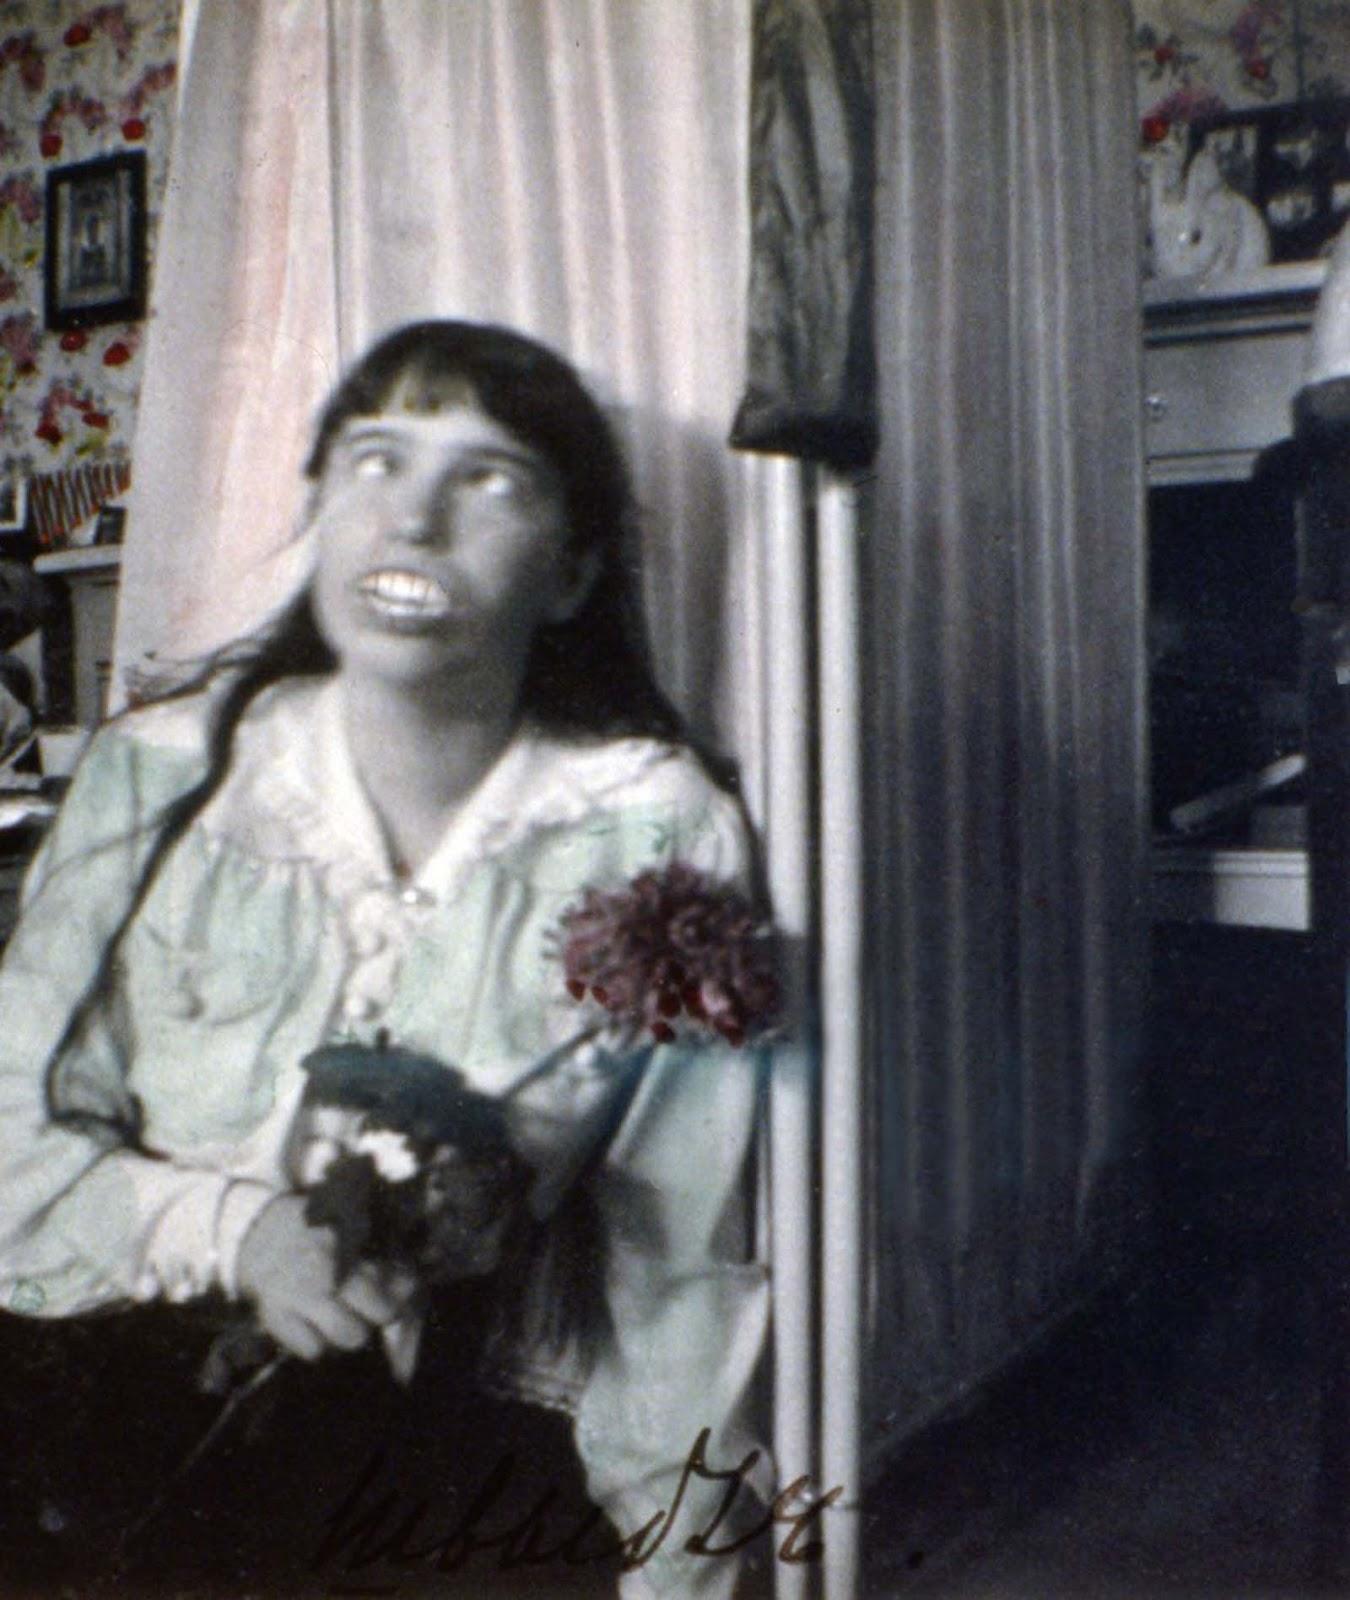 Anastasia Romanov pulling a face.